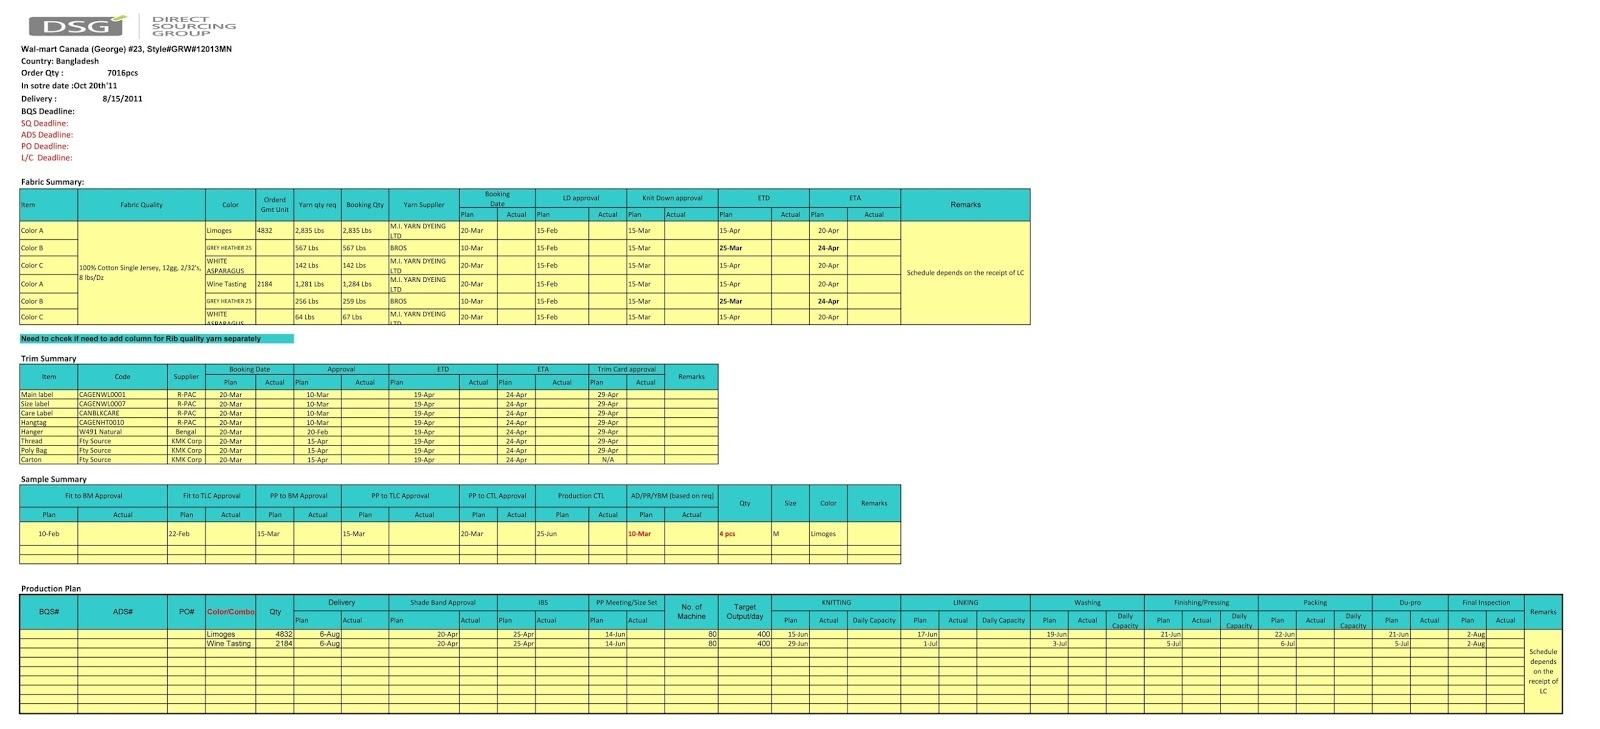 Time And Action Calendar Template regarding Time And Action Calendar Templates